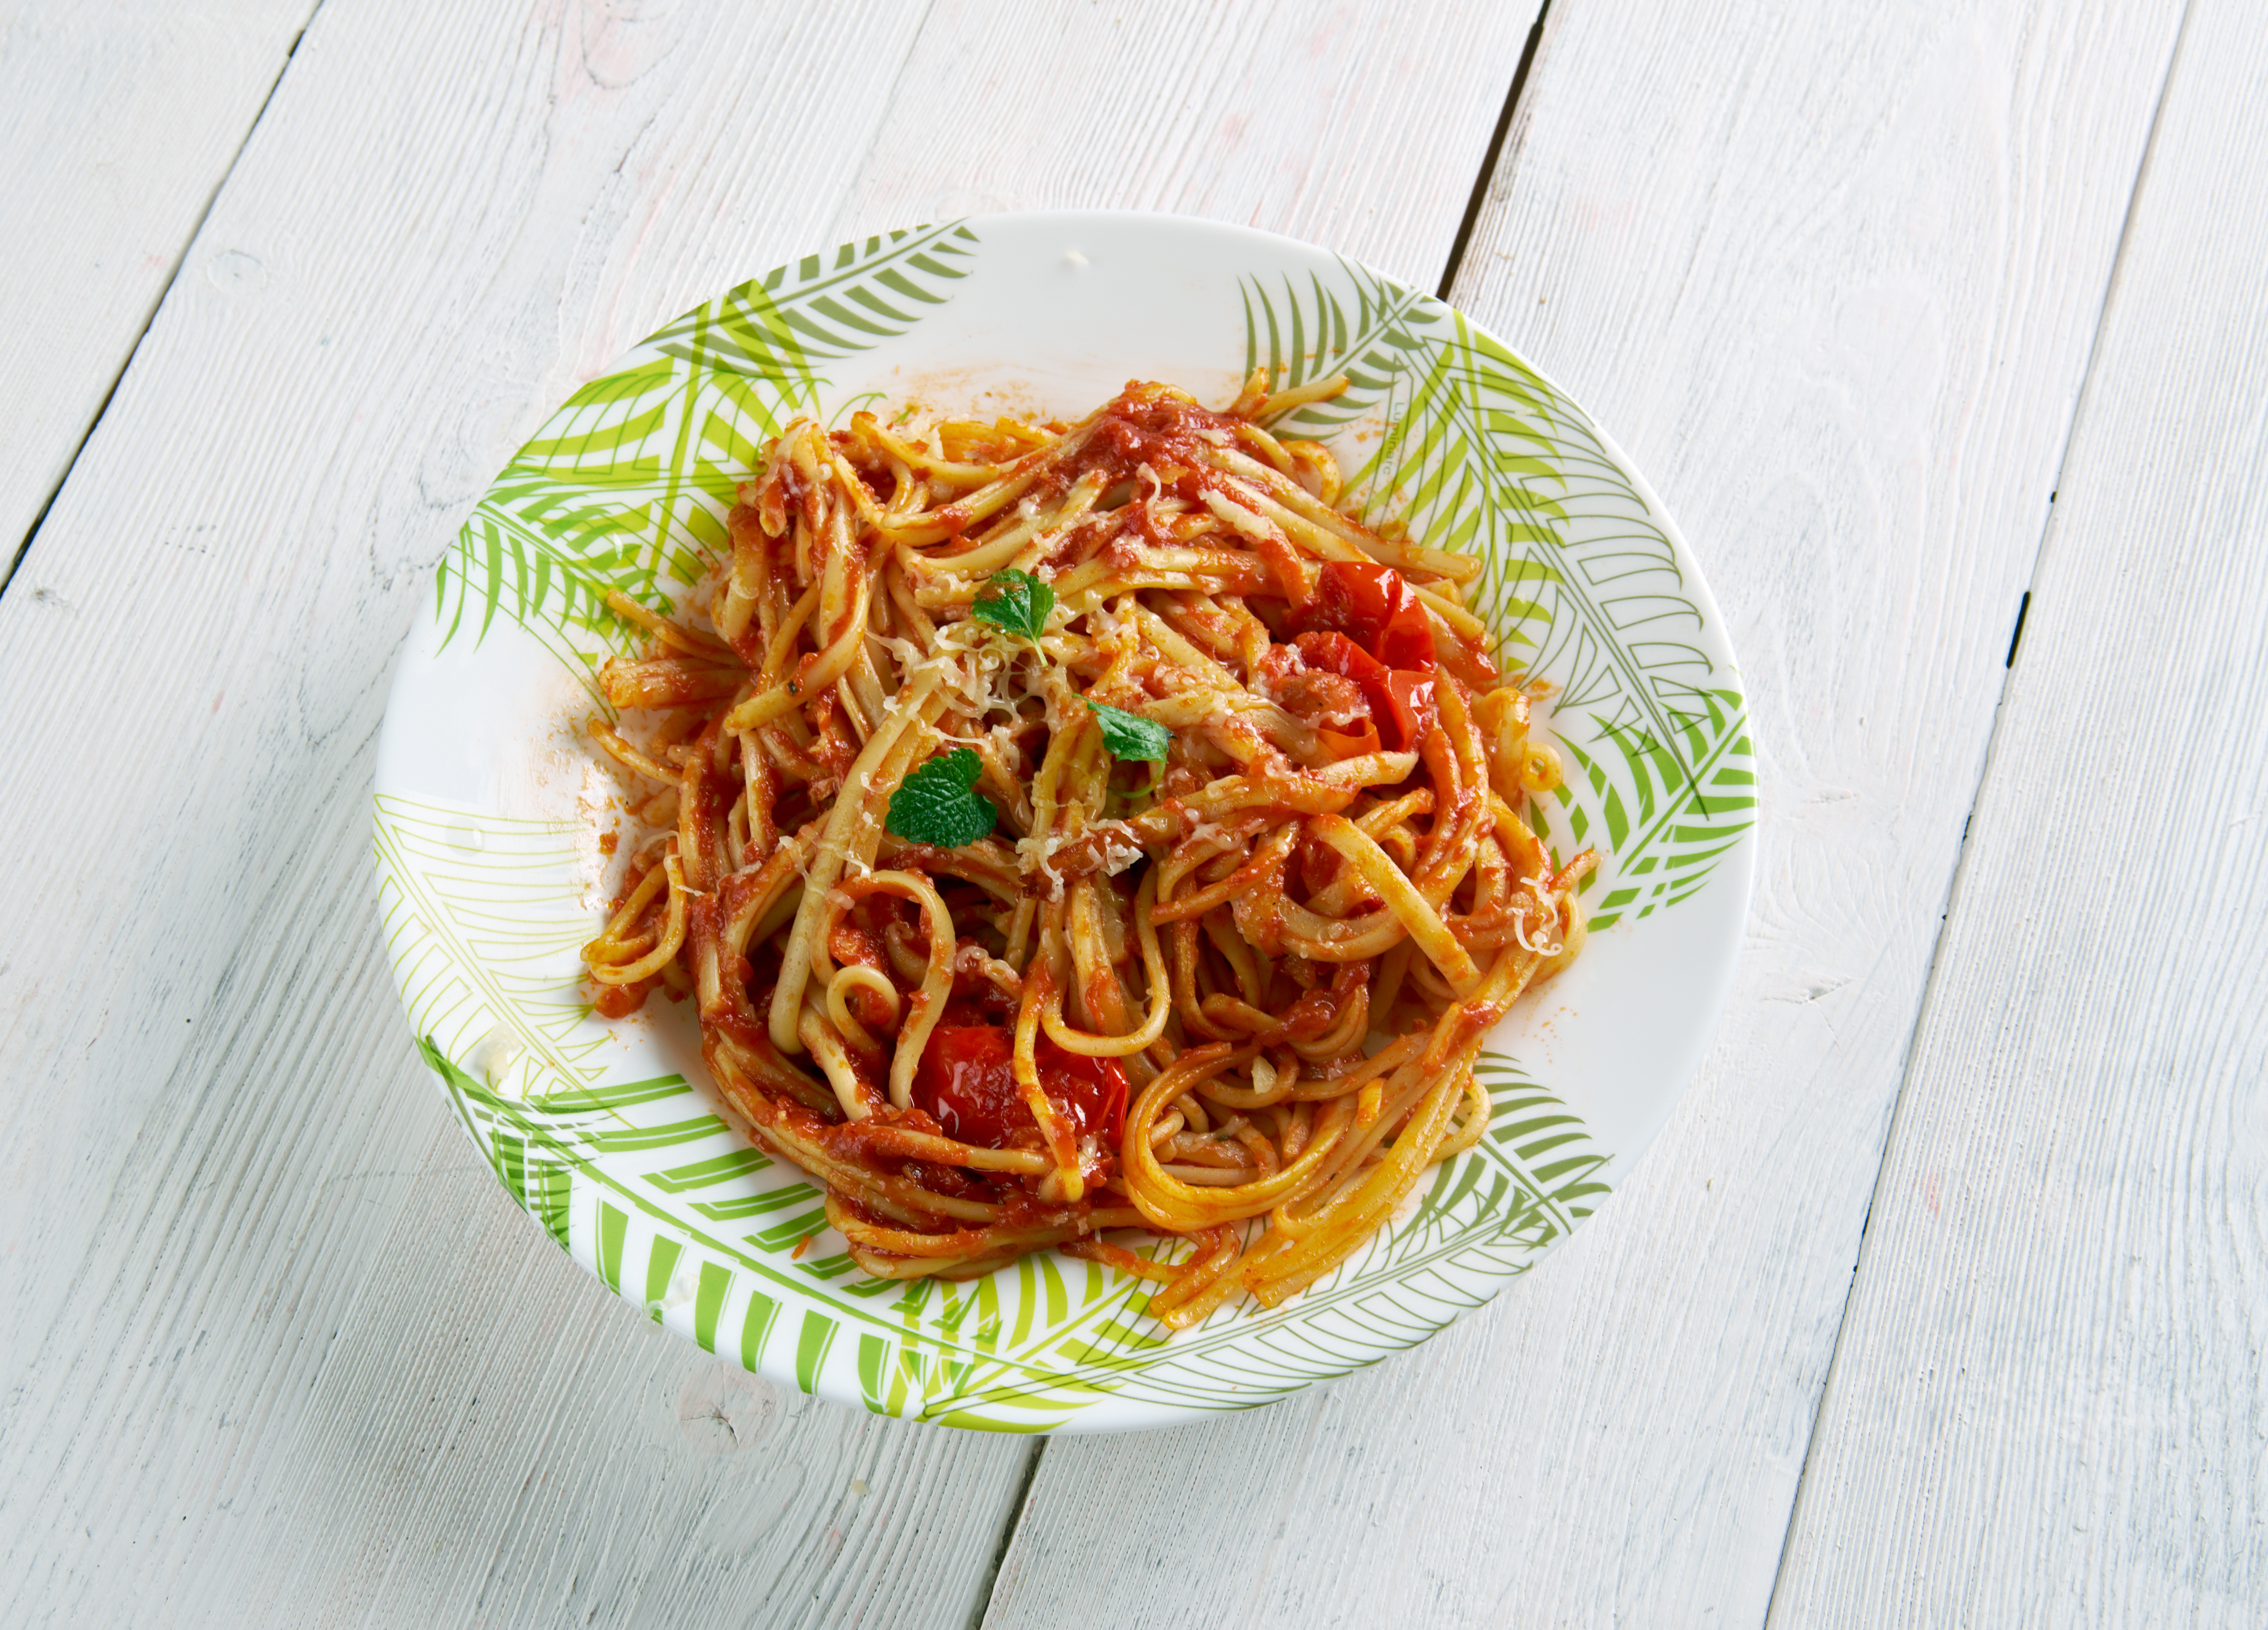 A dish of spaghetti all'Amatriciana